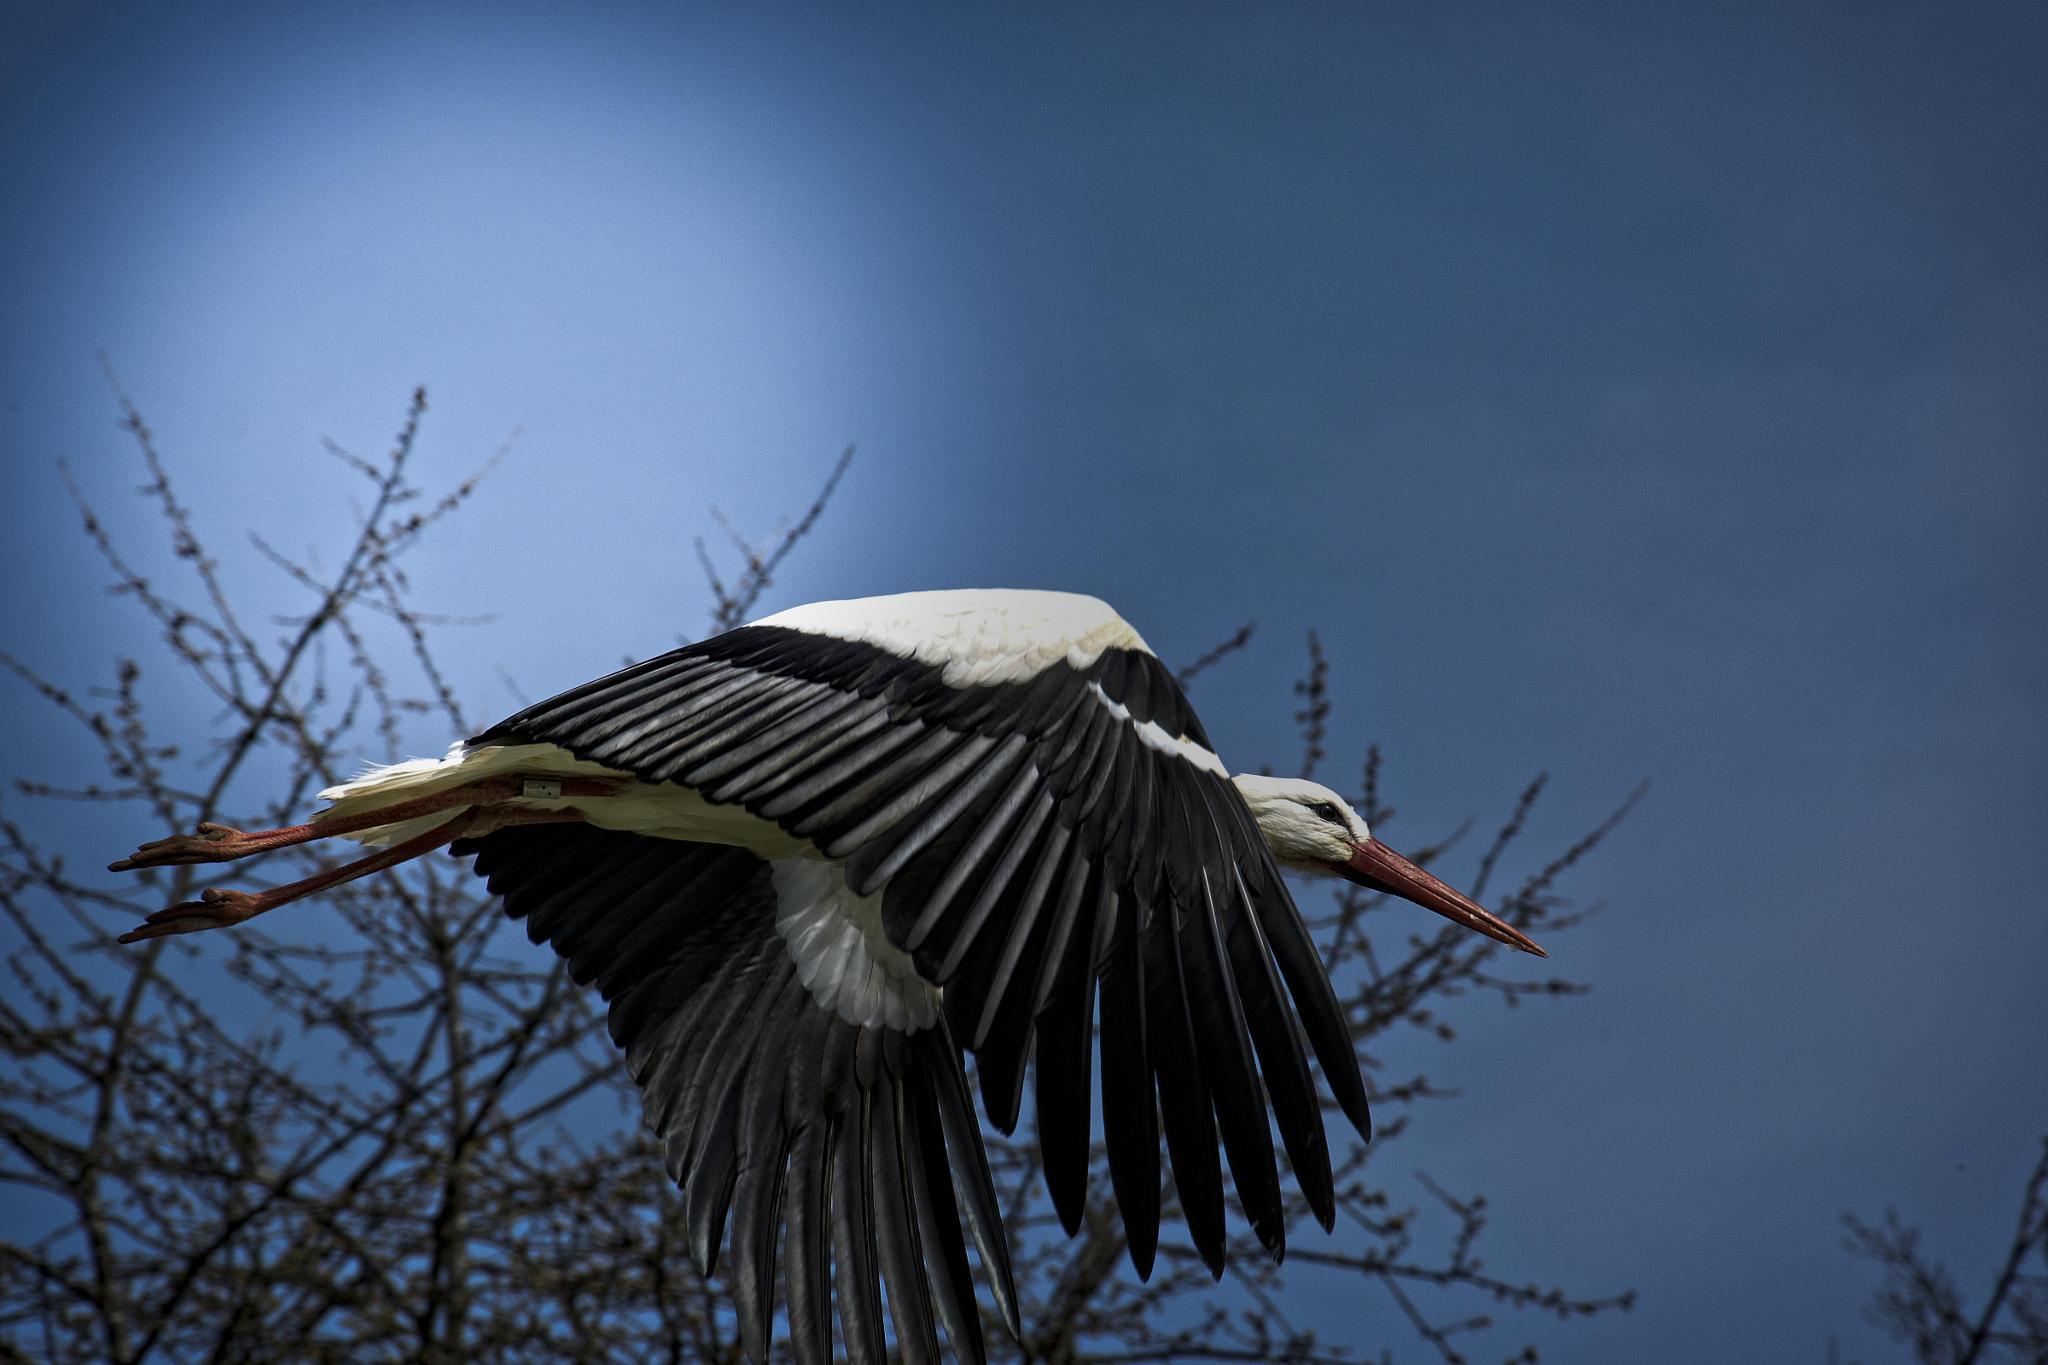 stork by Dastine